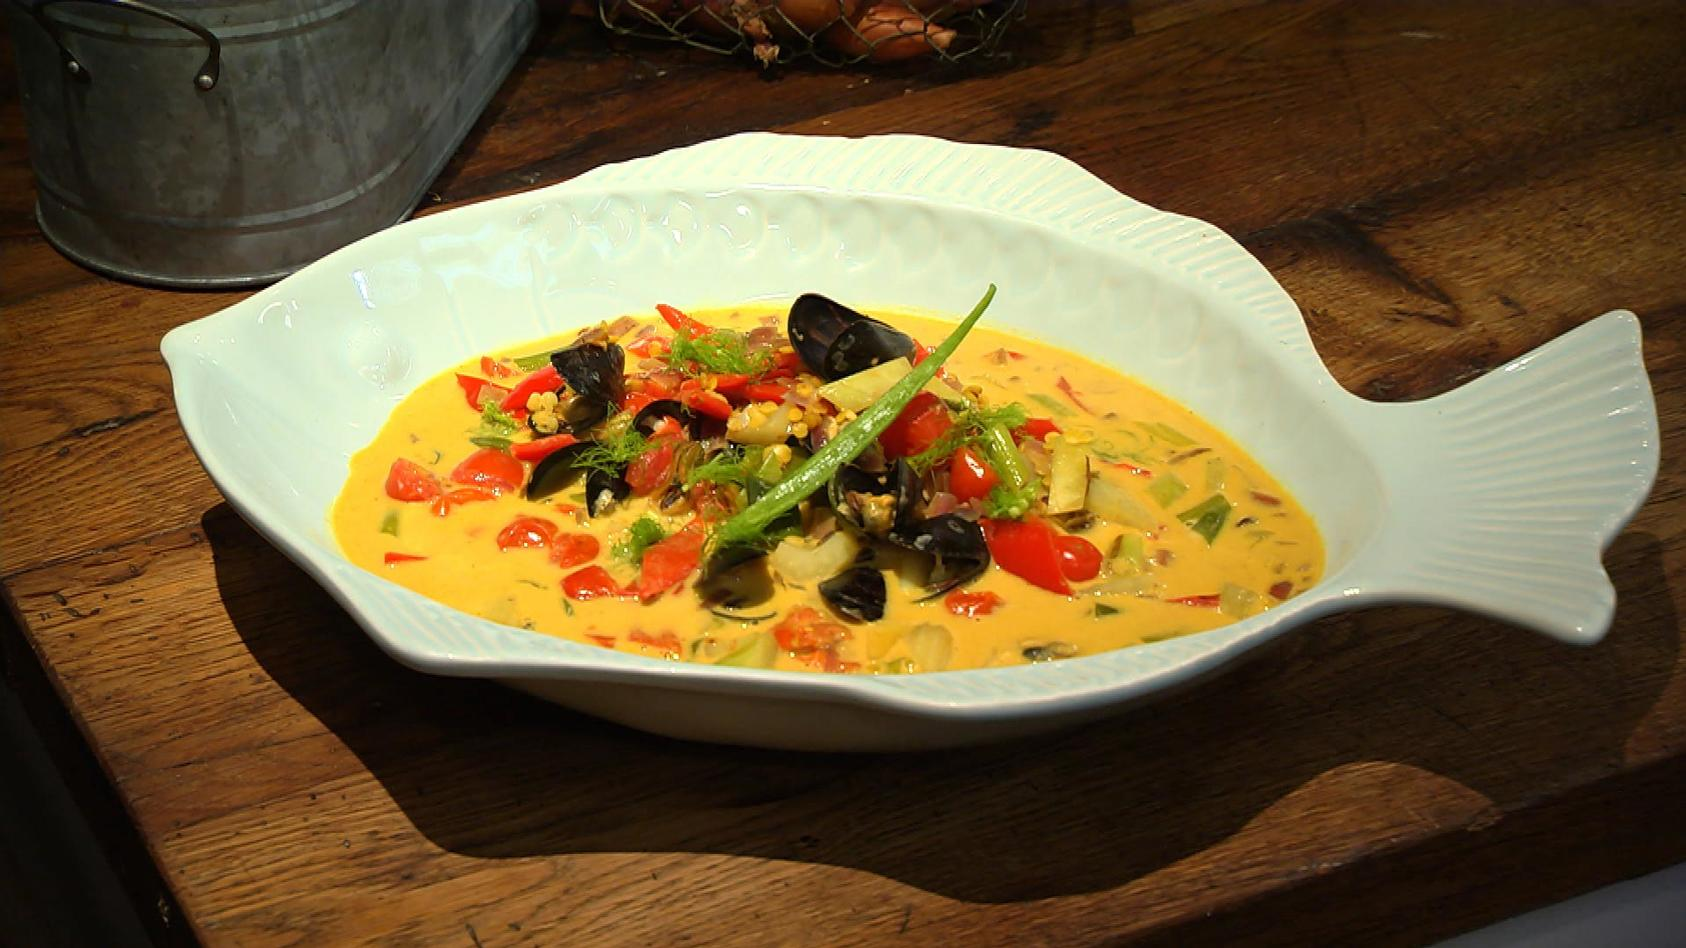 Spitzenküche so simpel, so lecker: Linsen-Muschel-Curry